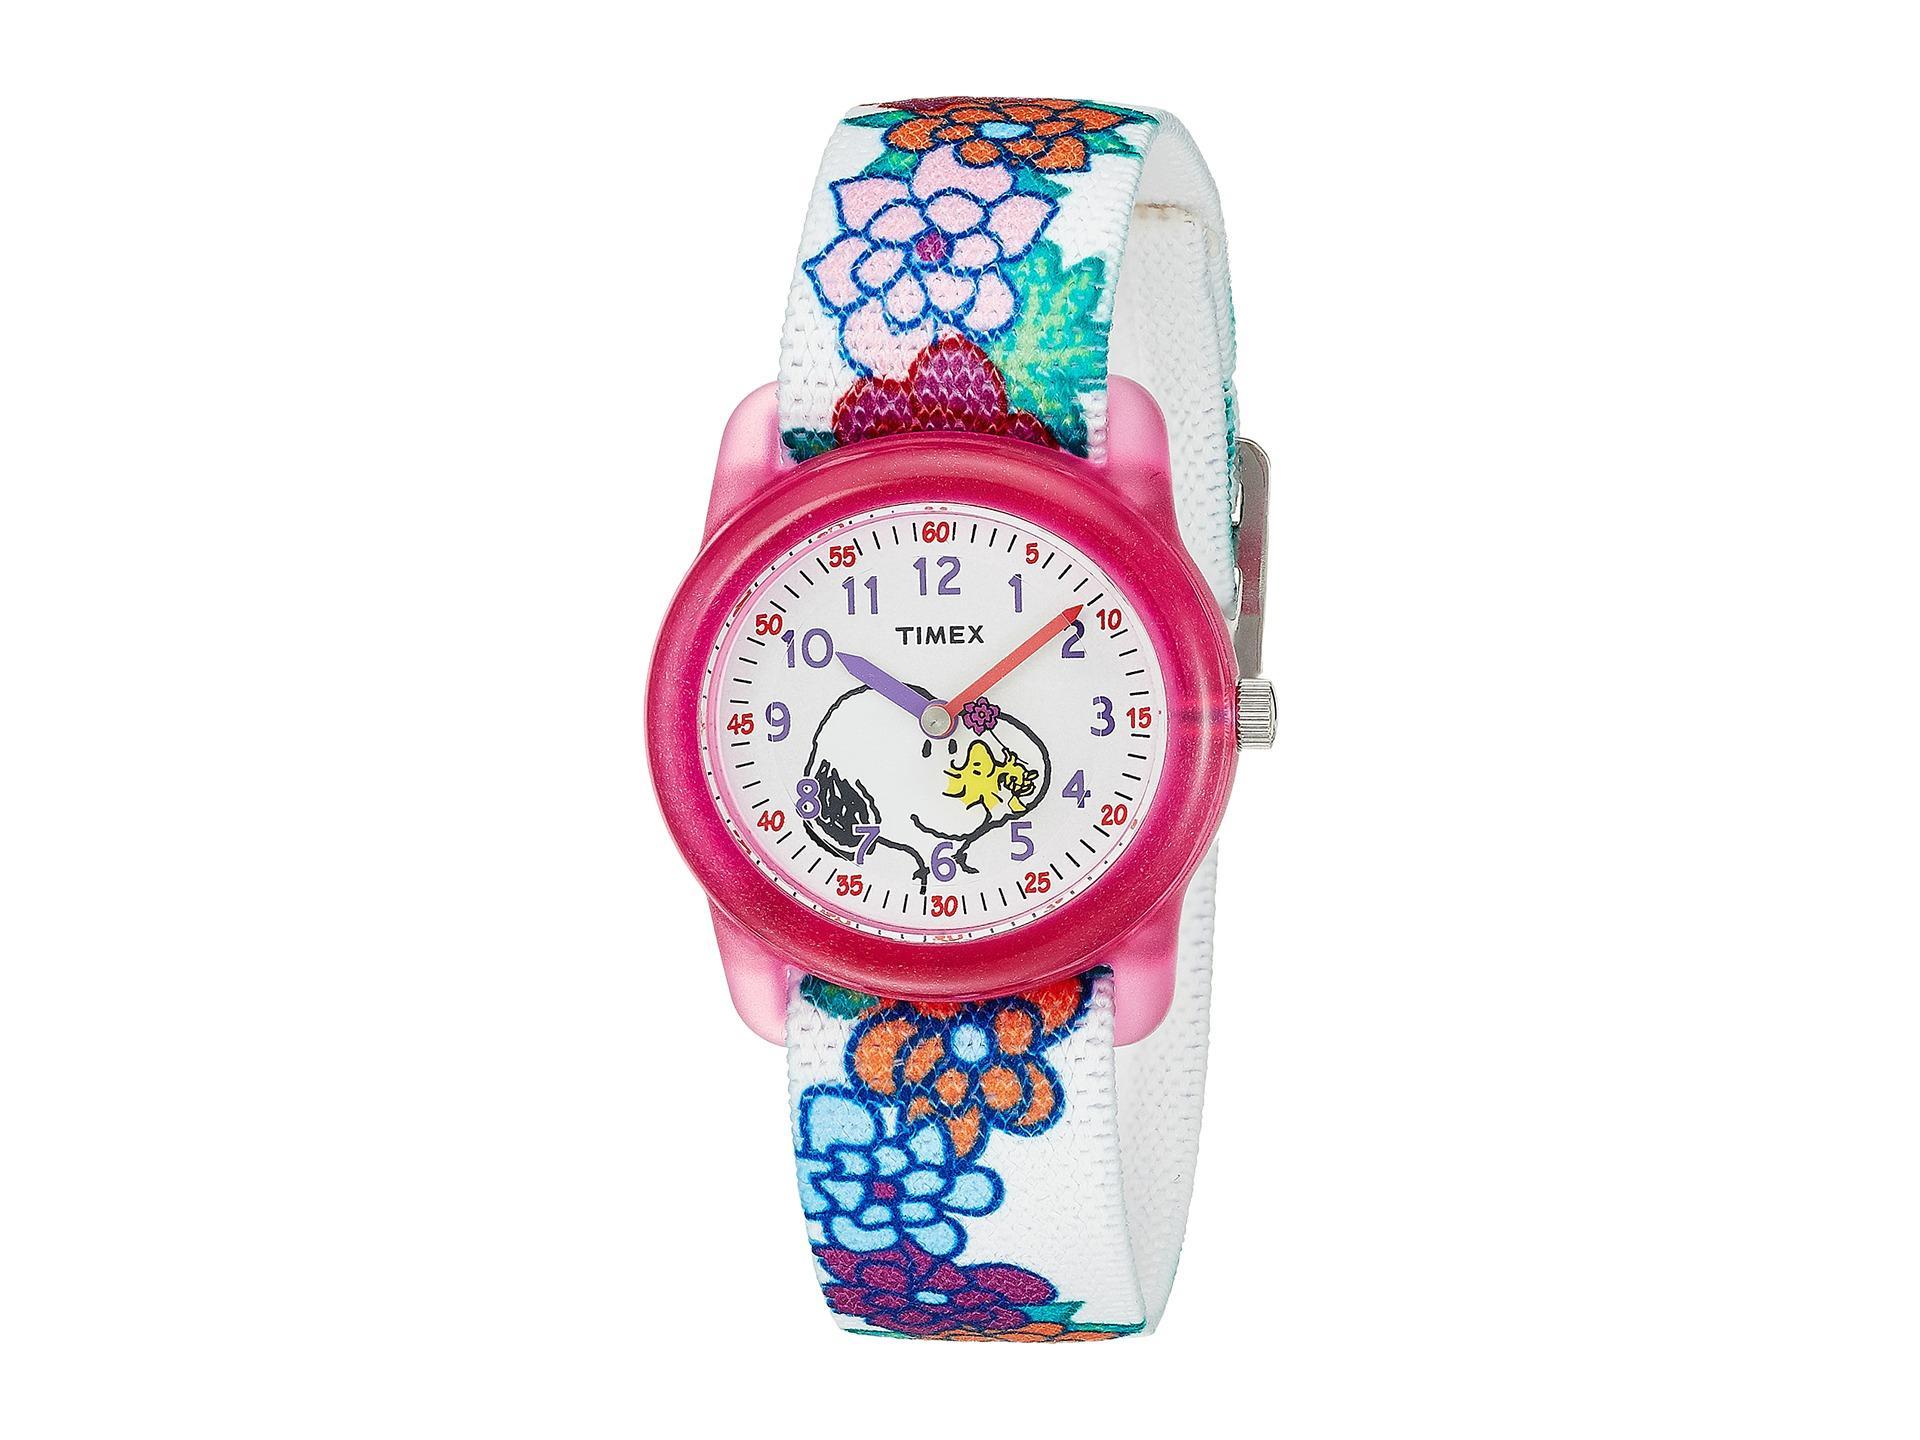 8b59184caa0e Lyst - Timex Time Machines Analog X Peanuts Elastic Fabric Strap